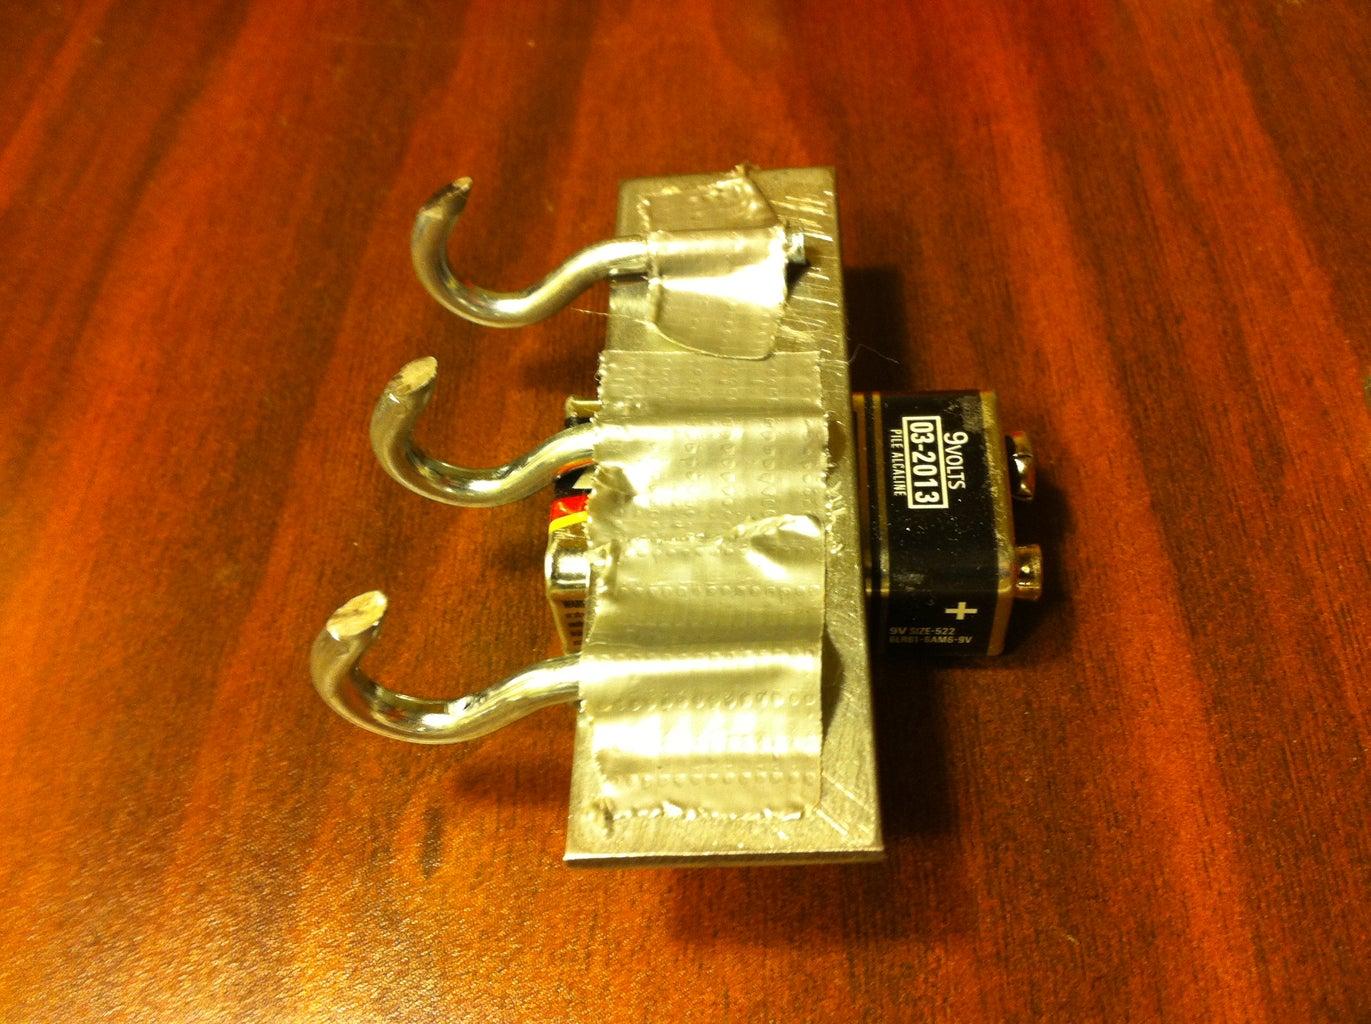 J-B Weld Hooks to Metal Plate